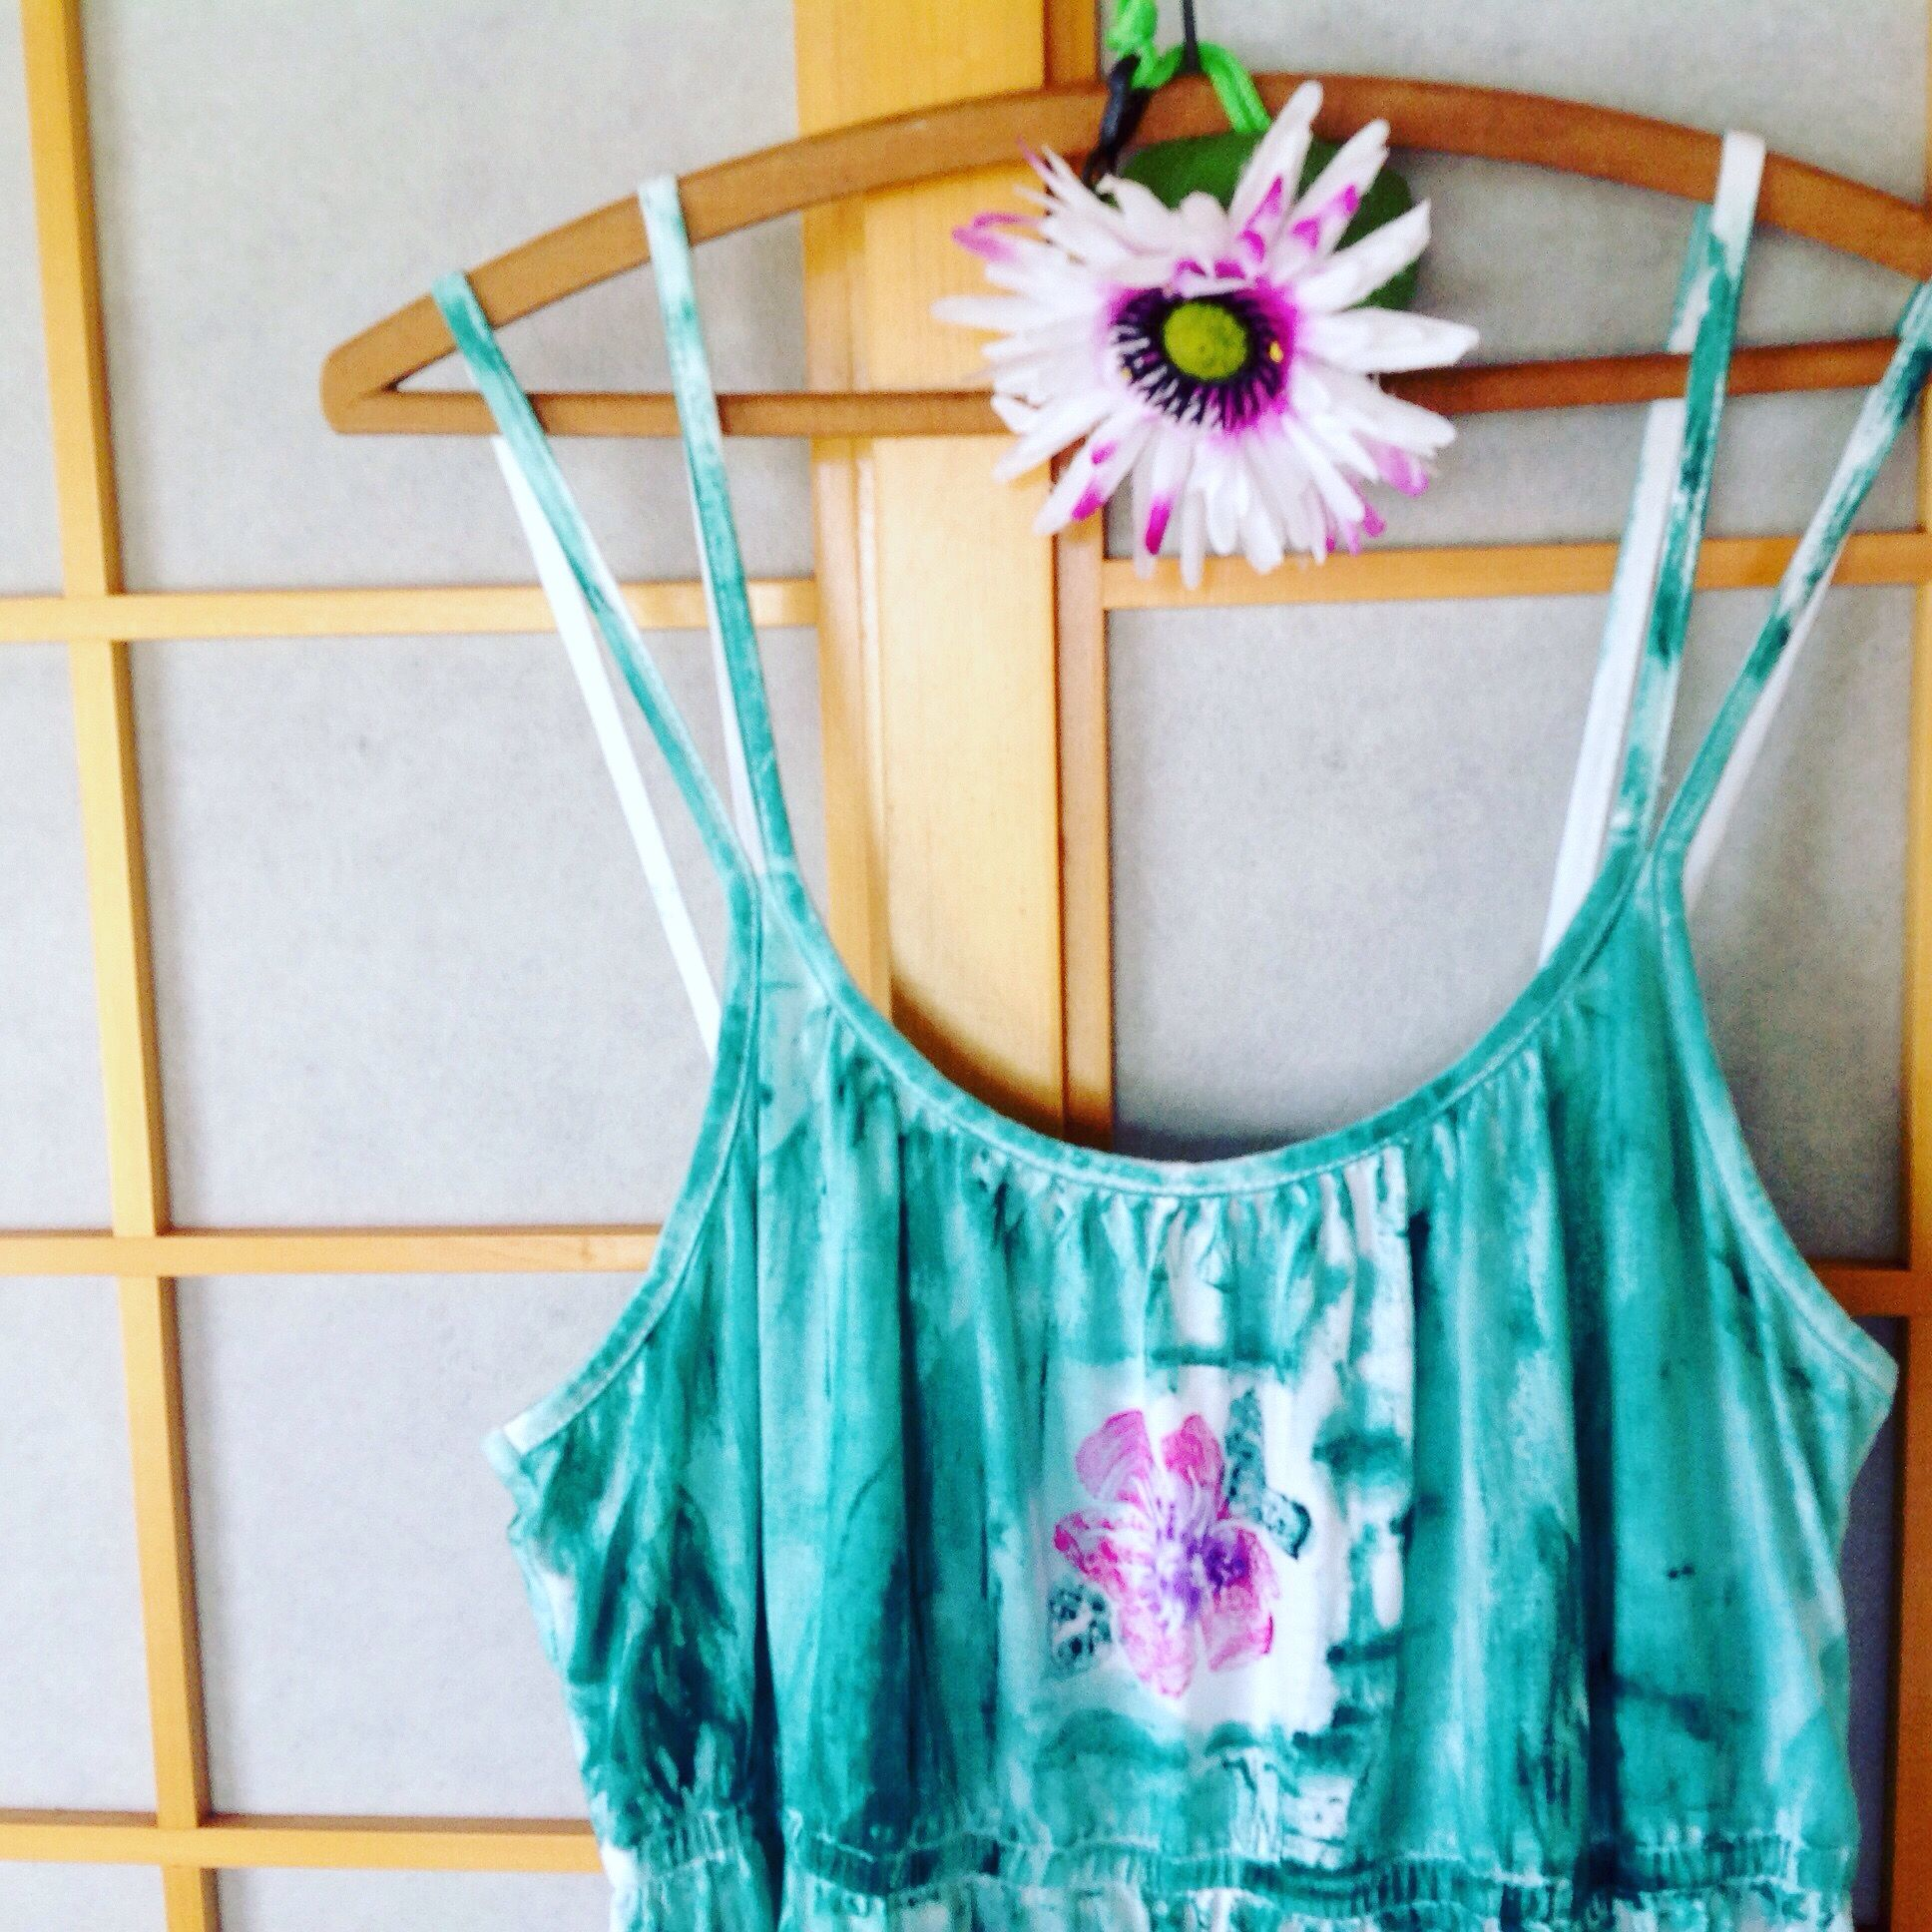 Hand painted maxi dress, beach wedding dress from Kaua'i